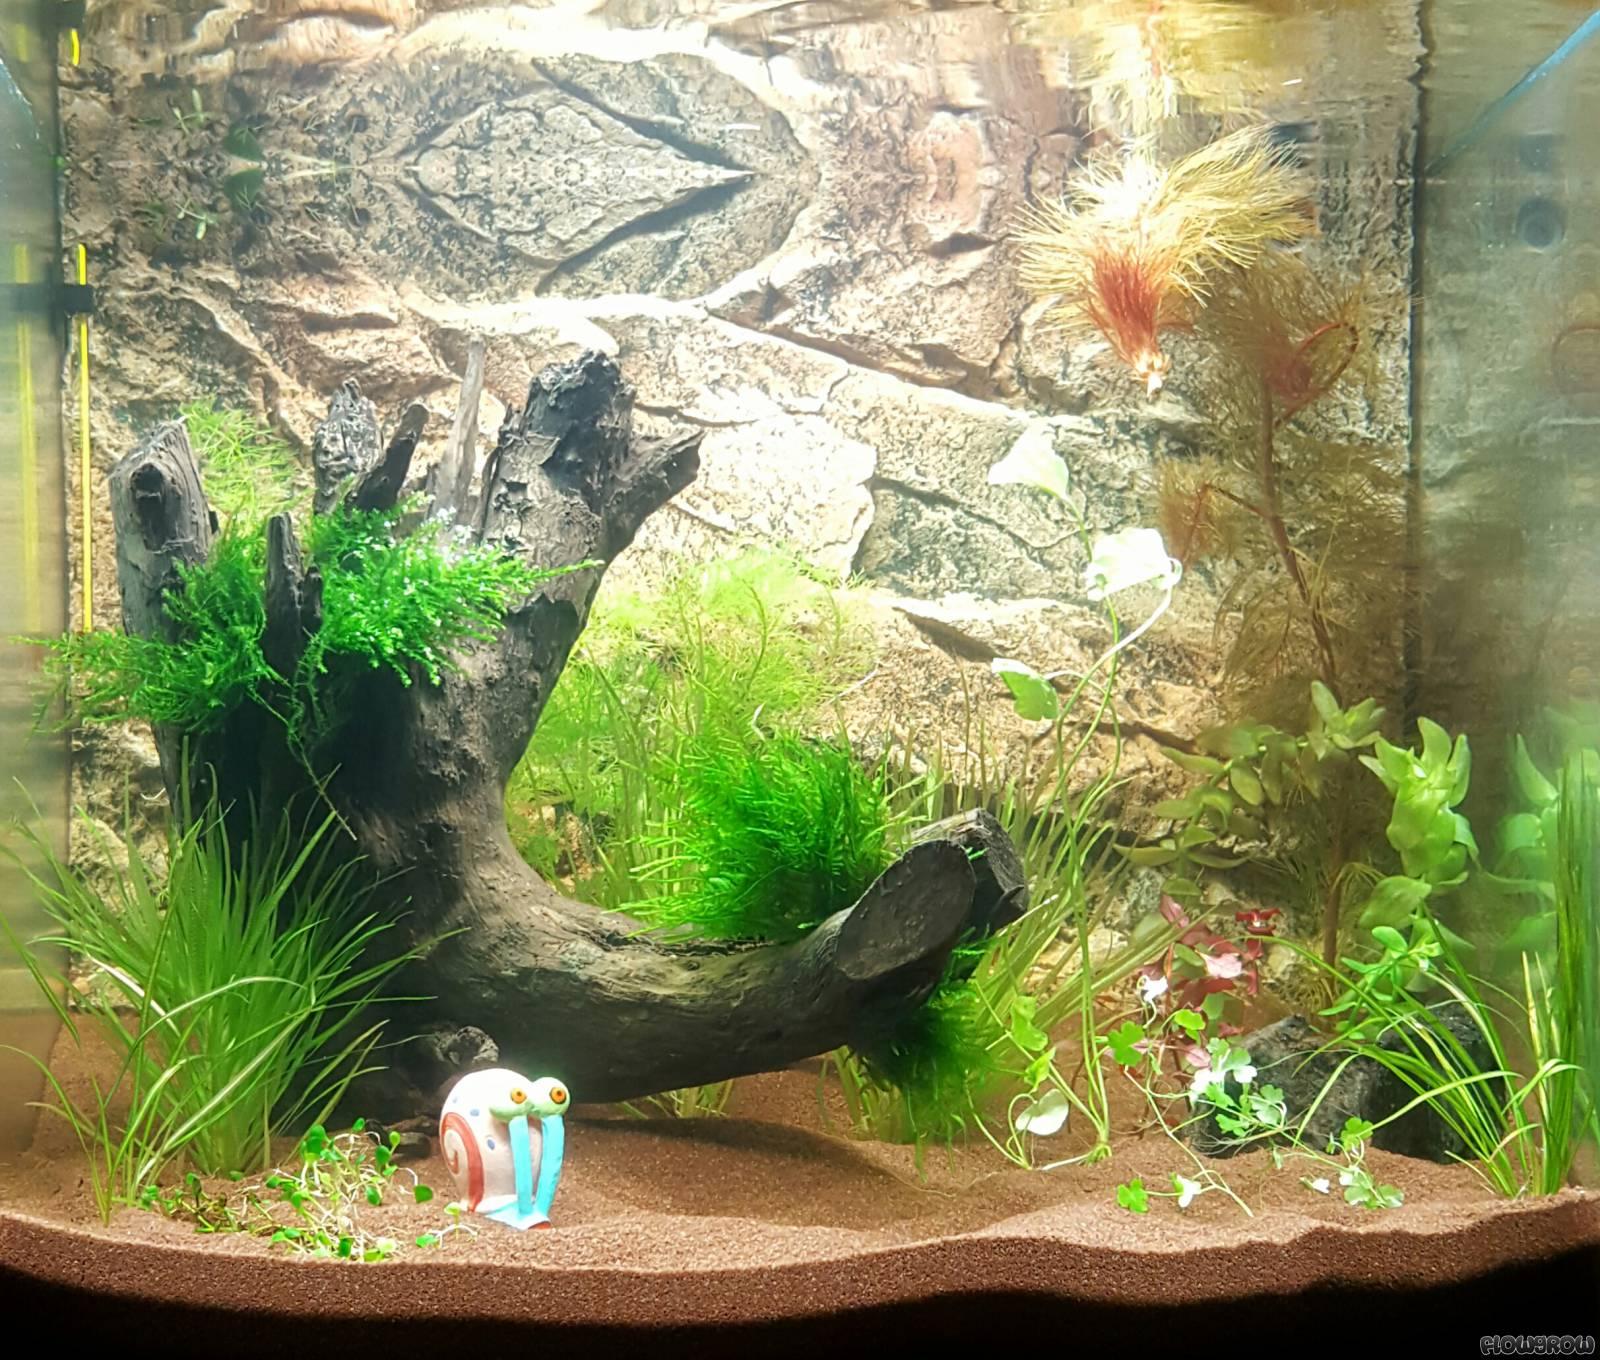 schildy focus 80 flowgrow aquascape aquarien datenbank. Black Bedroom Furniture Sets. Home Design Ideas